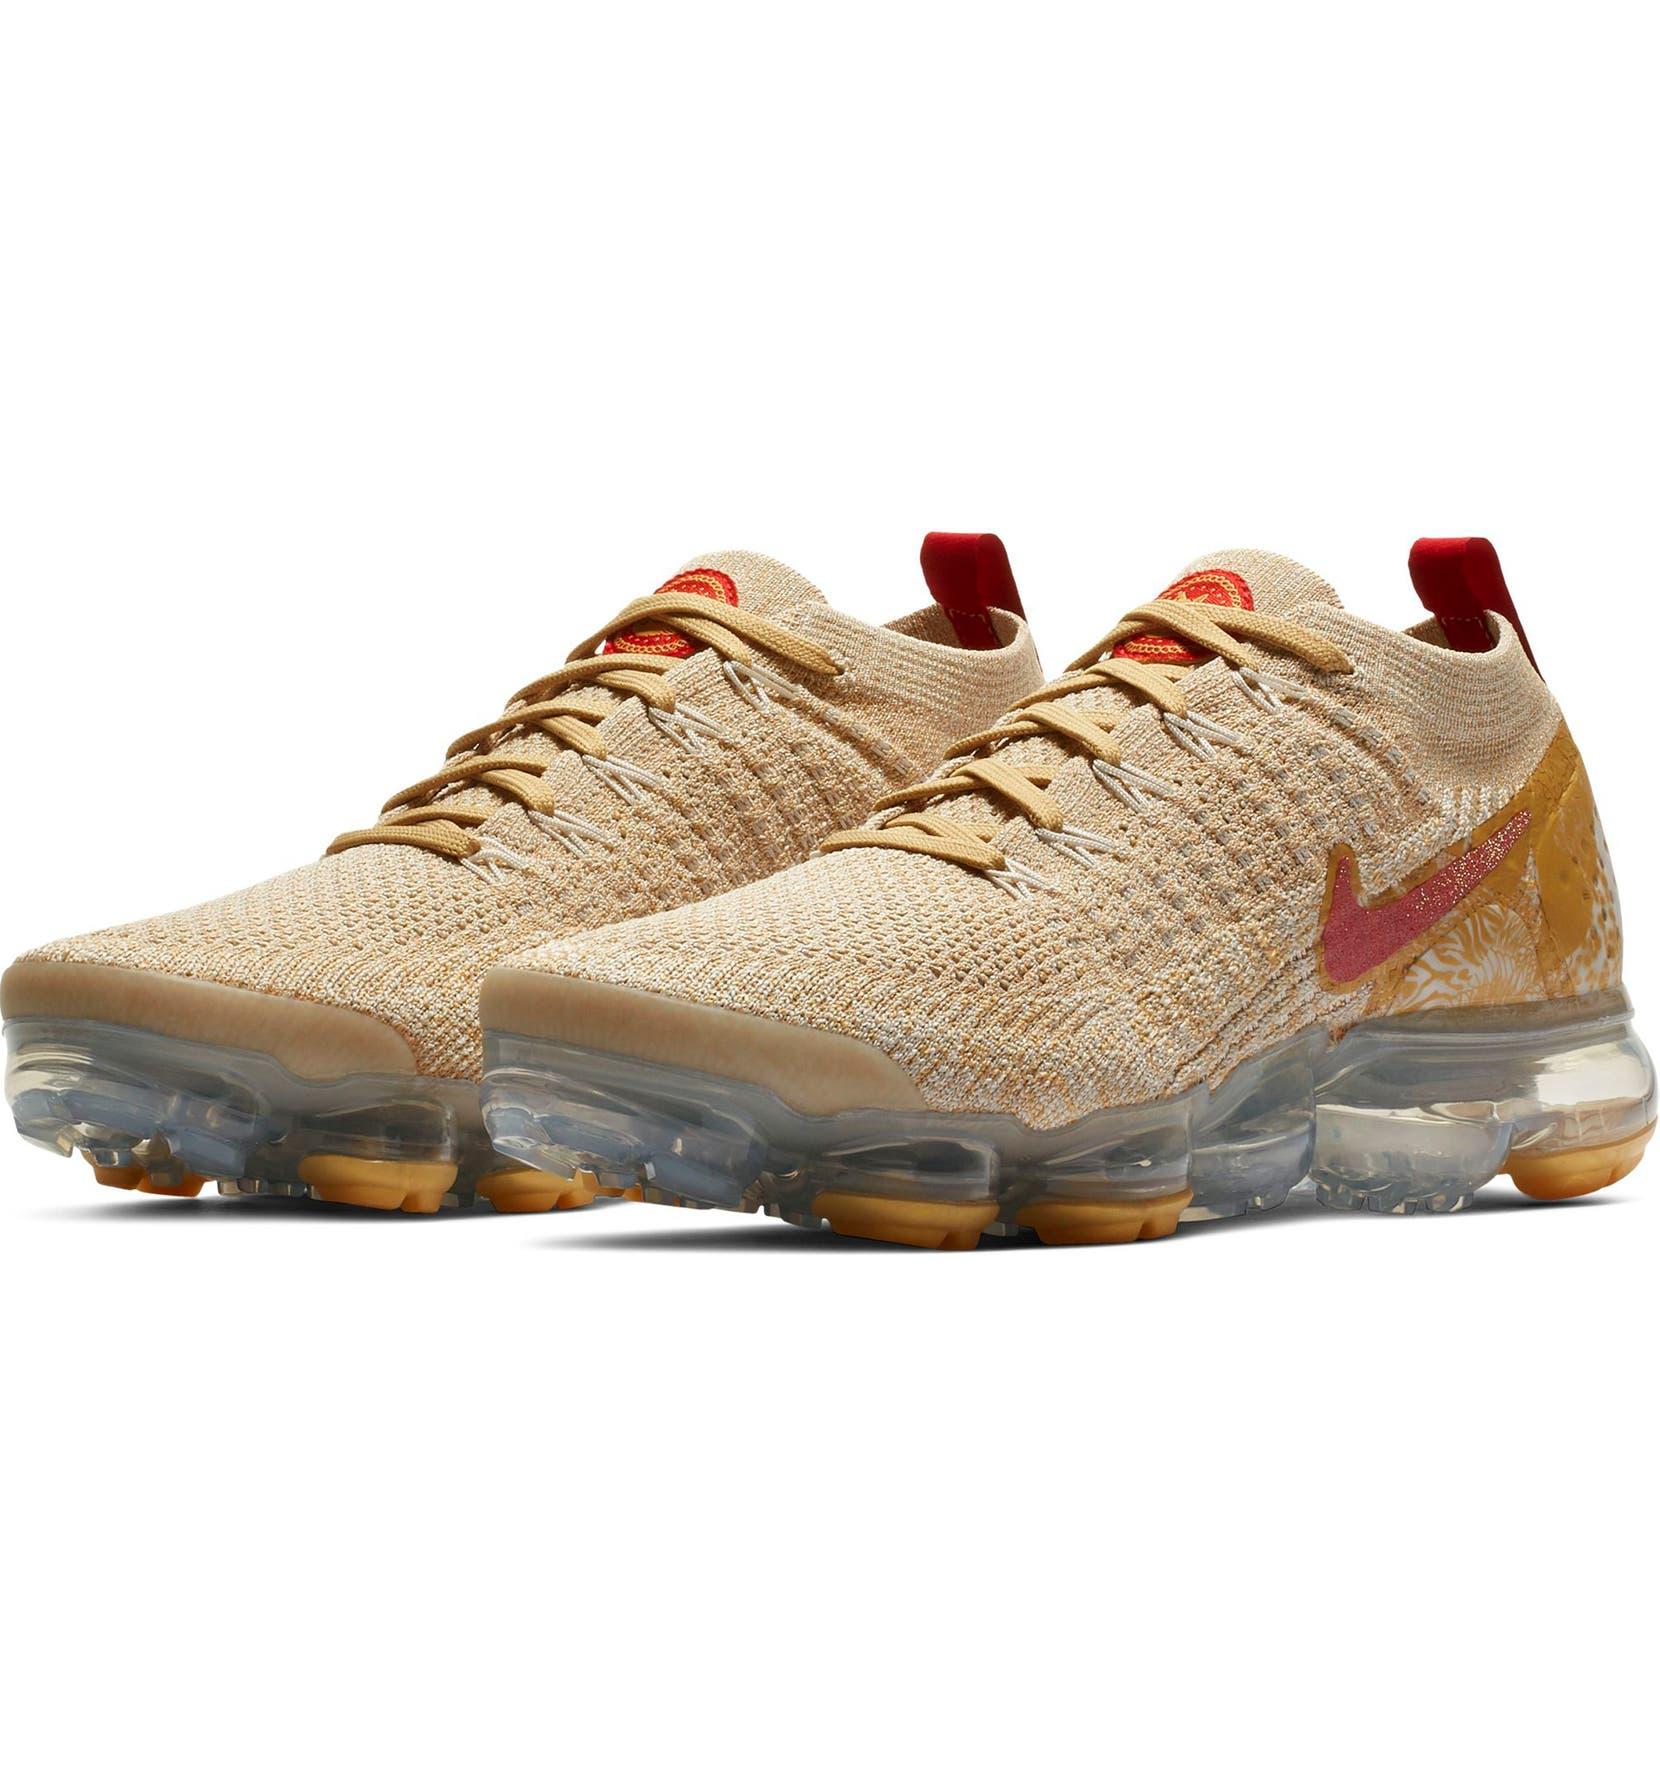 9b15803804886c Nike Air Vapormax Flyknit 2 Chinese New Year Running Shoe (Women ...